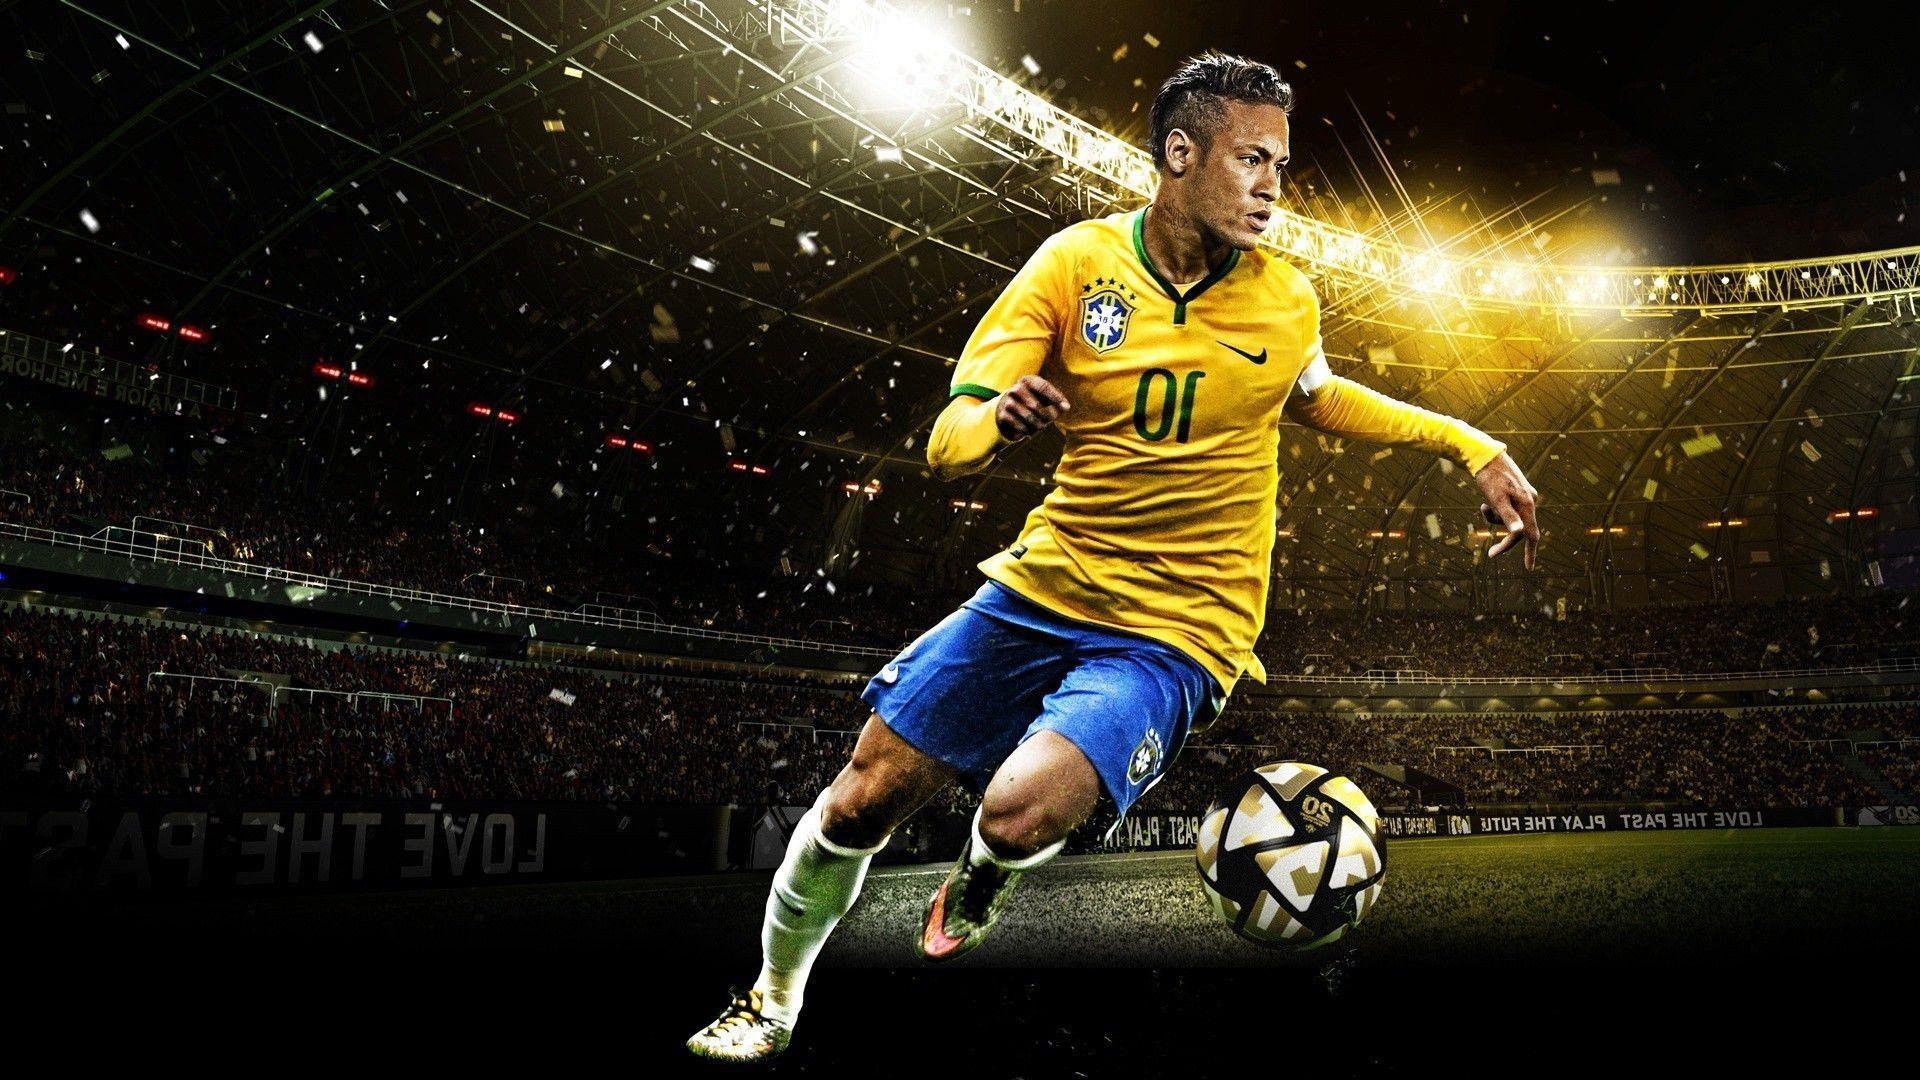 1920x1080 Neymar Brazil Hd Wallpapers 10 Neymar Brazil Hd Wallpapers 1920x1080 Neymar Neymar Jr Wallpapers Neymar Jr